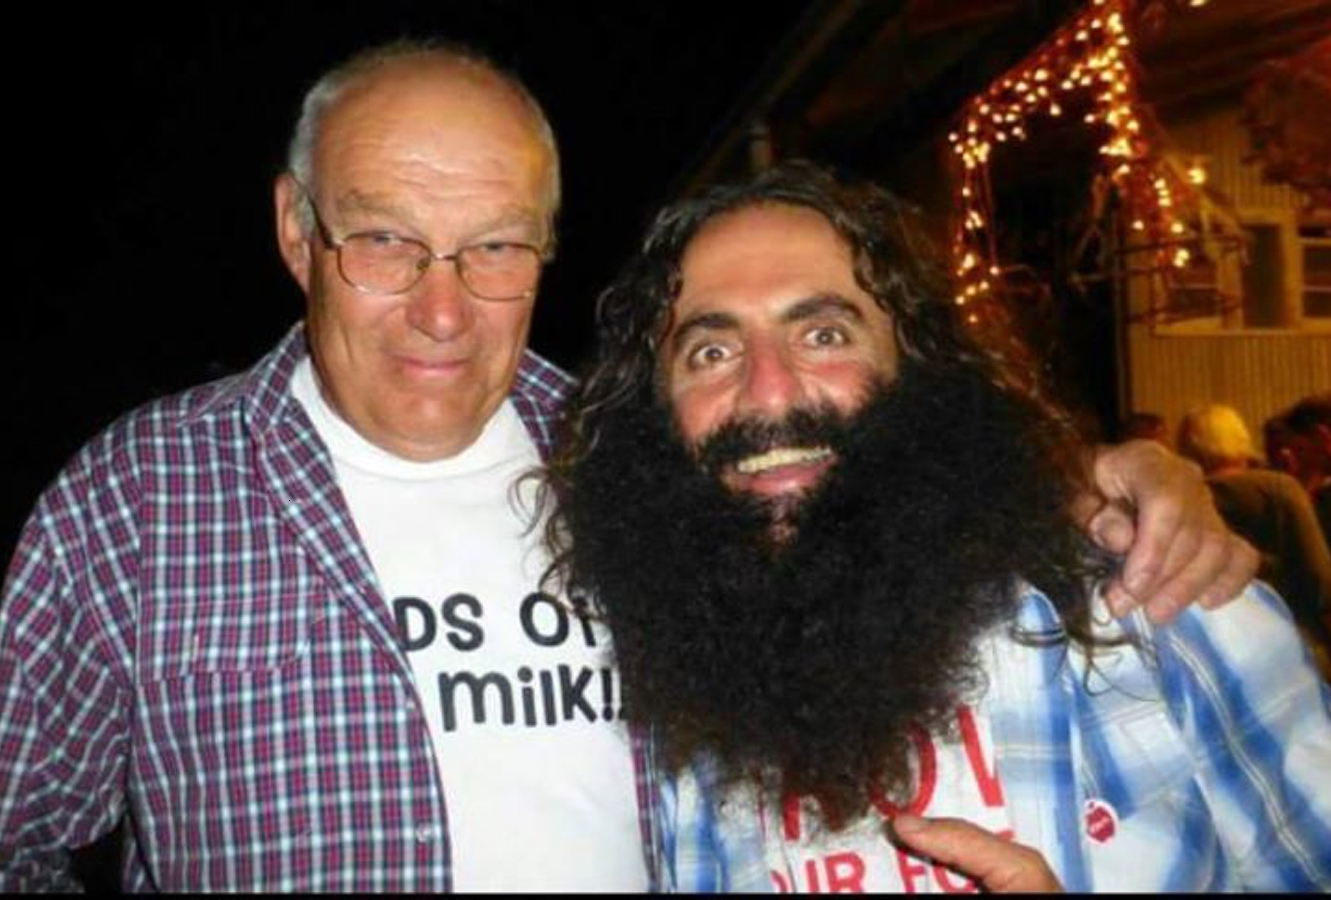 Dairy farmer Reg Matthews and Costa